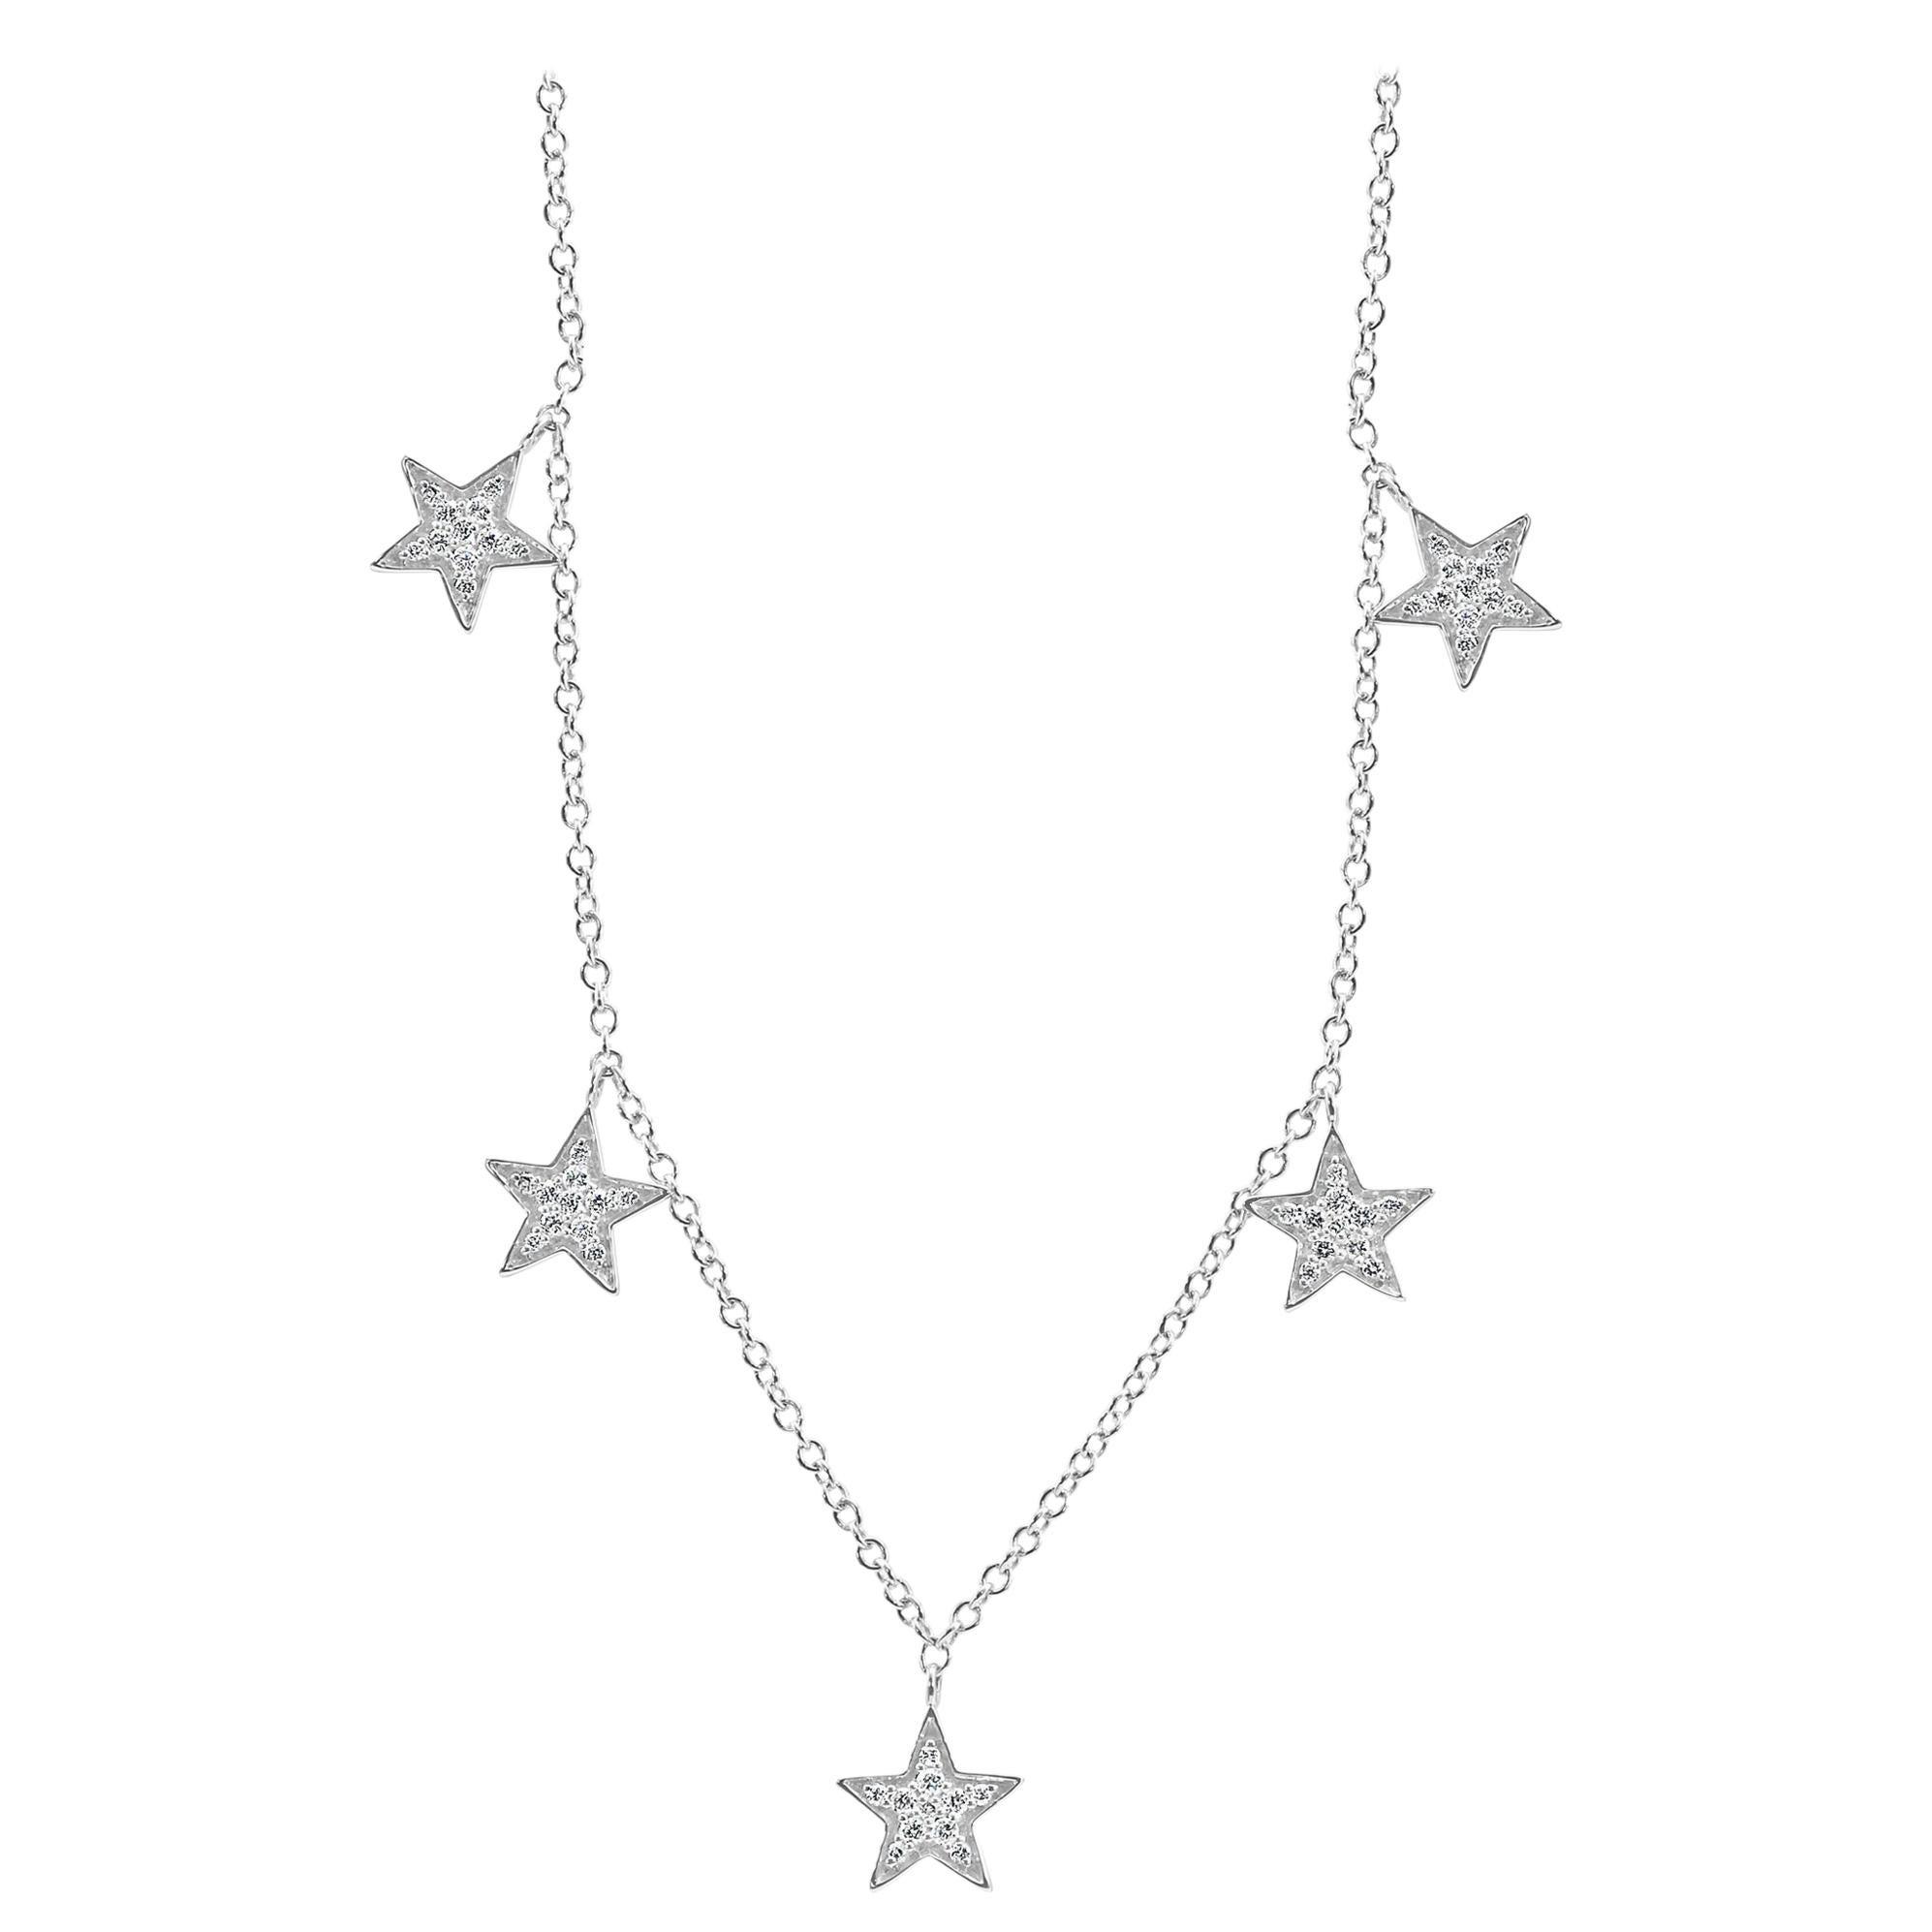 White Diamond Round 14K Gold Fashion Dangle Drop 5 Star Pendant Chain Necklace